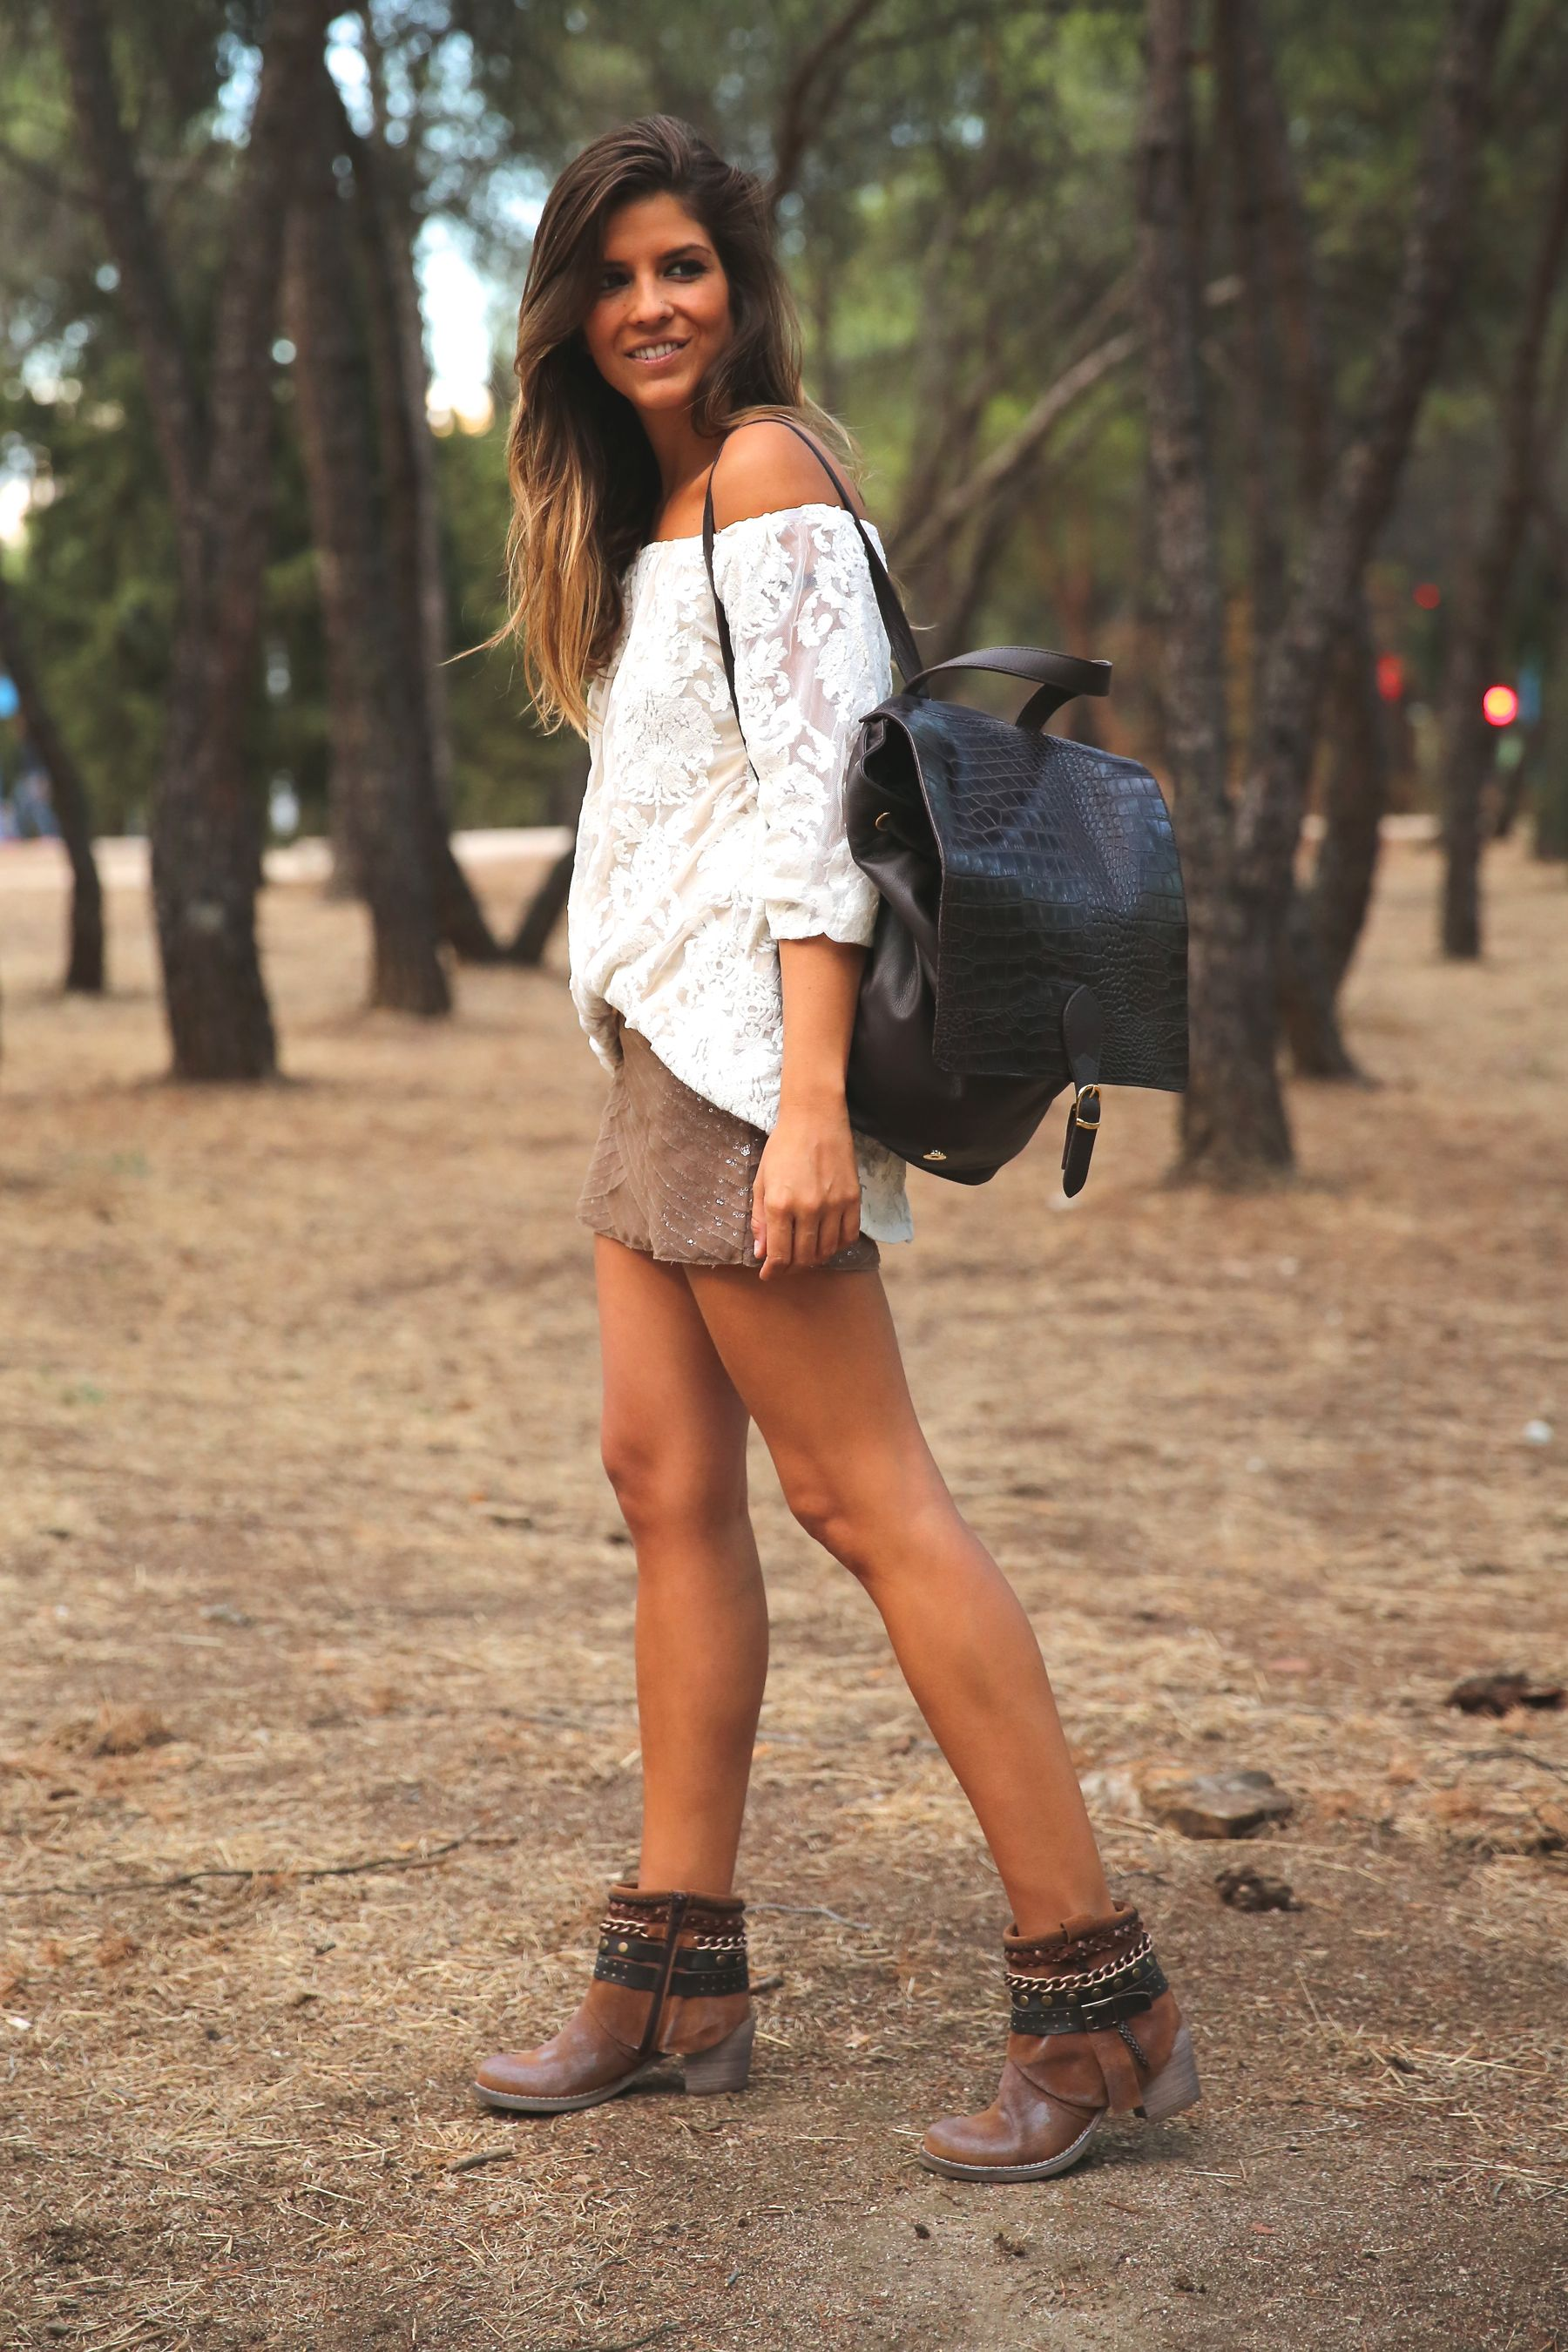 trendy_taste-look-outfit-street_style-ootd-blog-blogger-fashion_spain-moda_españa-primavera/verano-boho-trendy-planes_de_día-lentejuelas-falda-botines-étnico-mochila-crochet-encaje-11